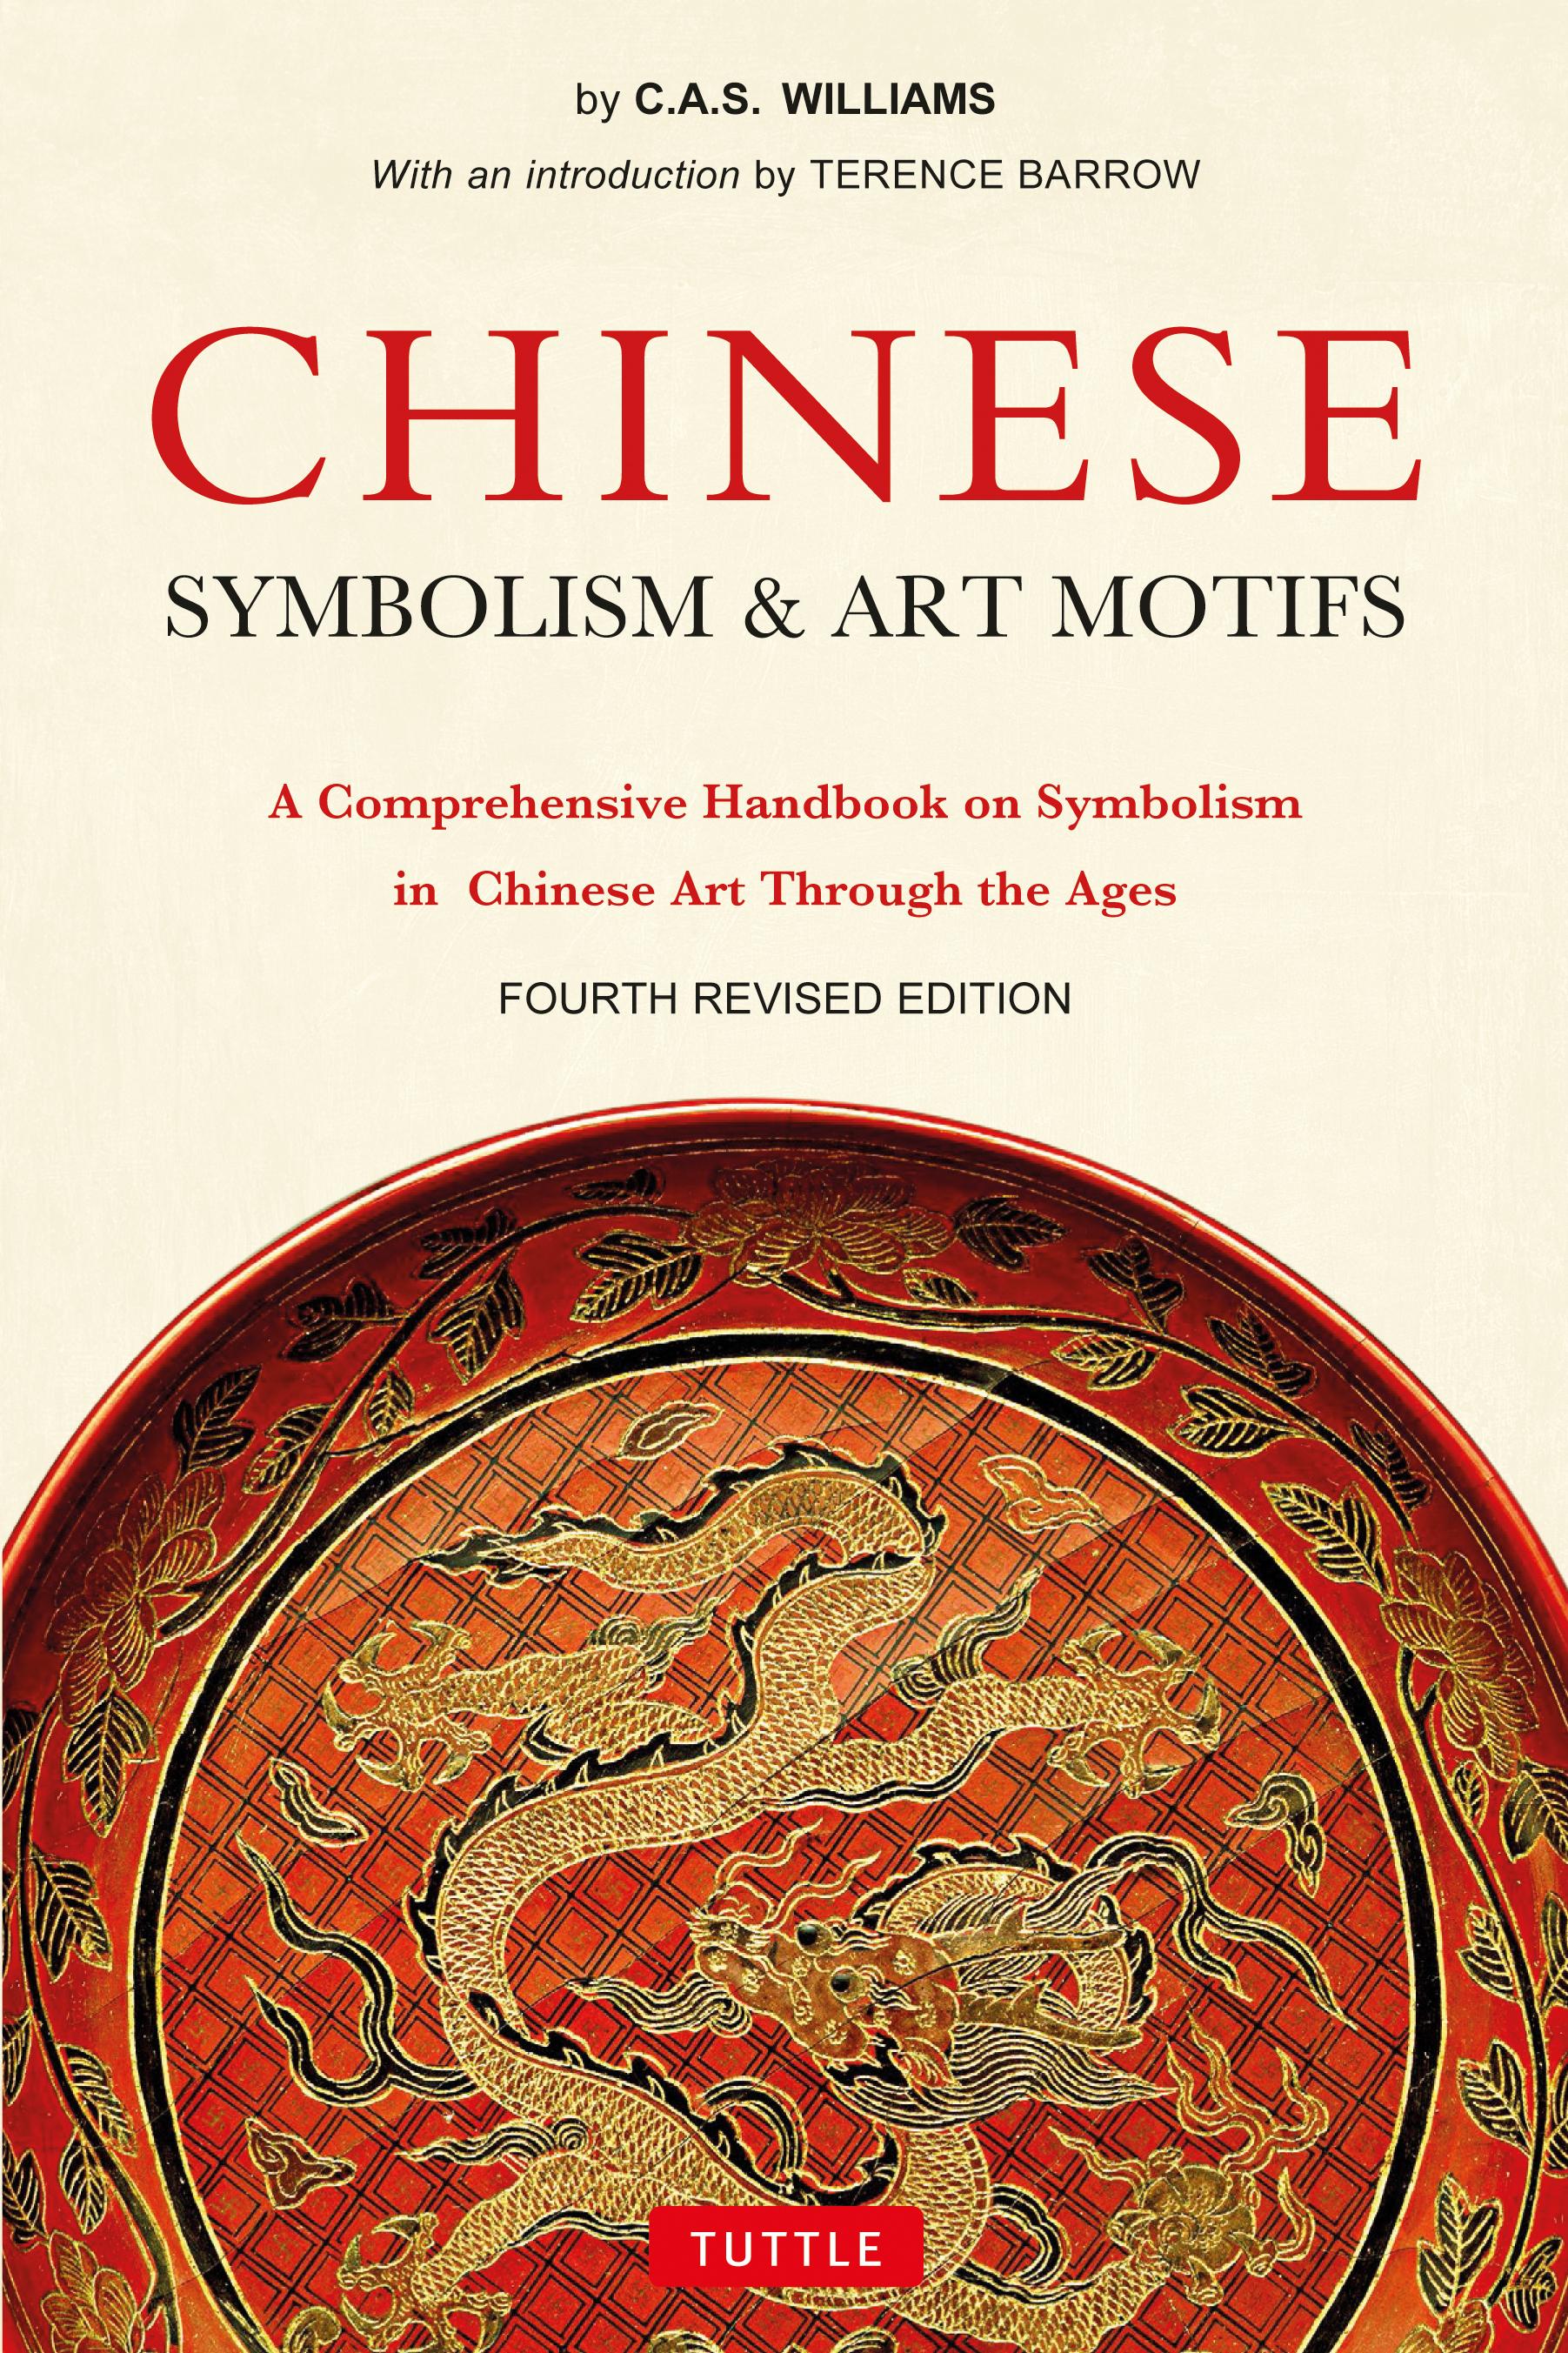 Chinese Symbolism & Art Motifs Fourth Revised Edition